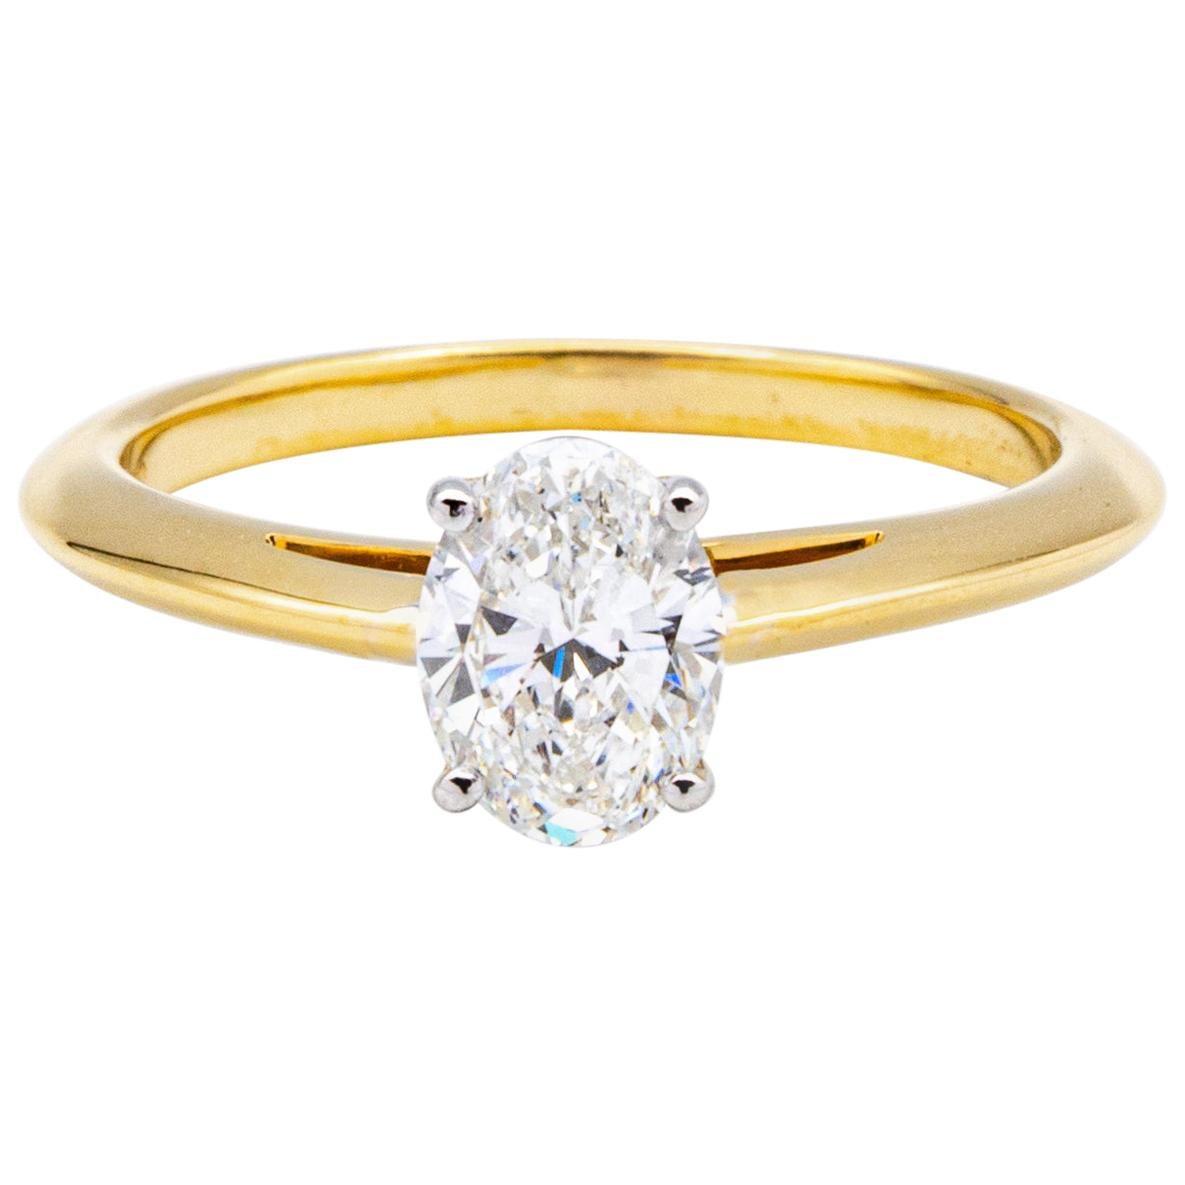 Tiffany & Co. 18K Yellow Gold + Plat Oval Diamond Engagement Ring .79 Ct G VS1